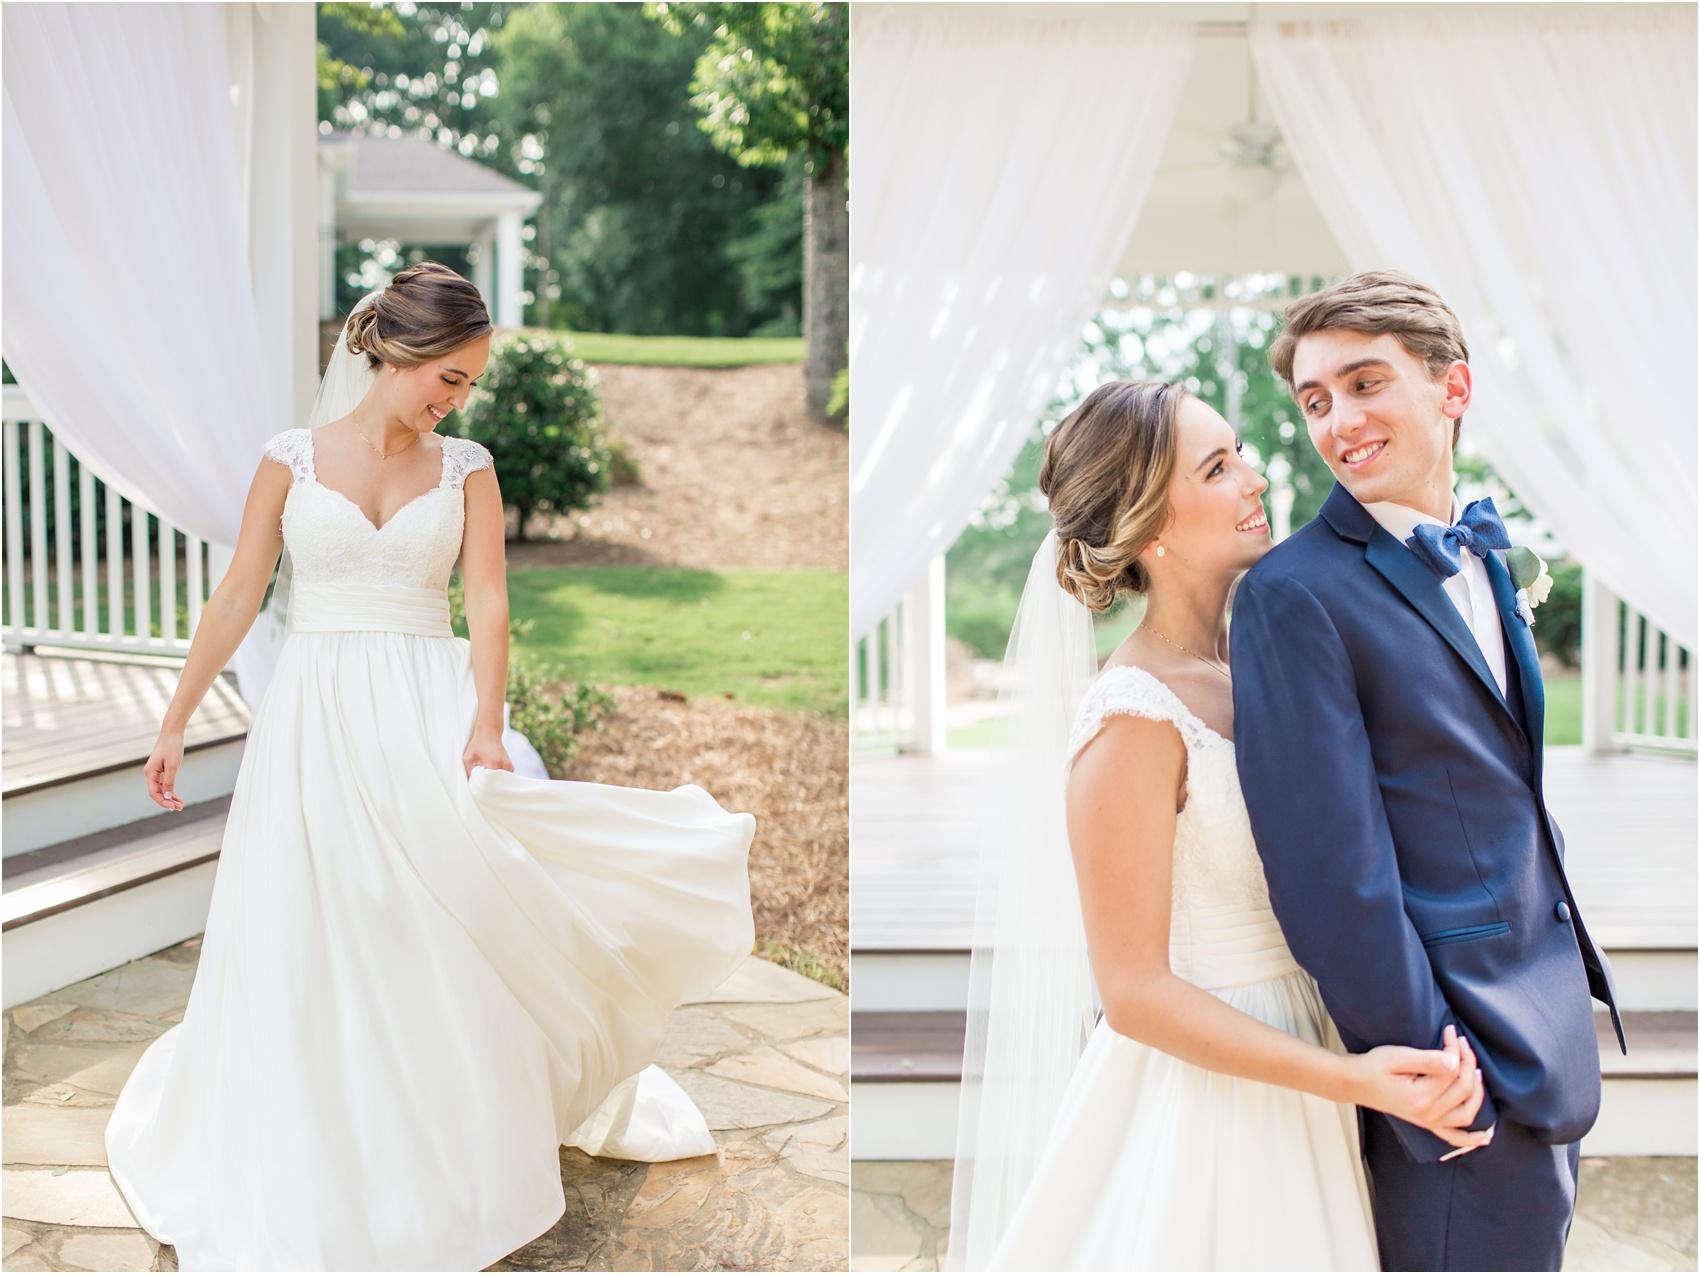 Savannah Eve Photography- Sigl-Adams Wedding- Sneak Peek-57.jpg